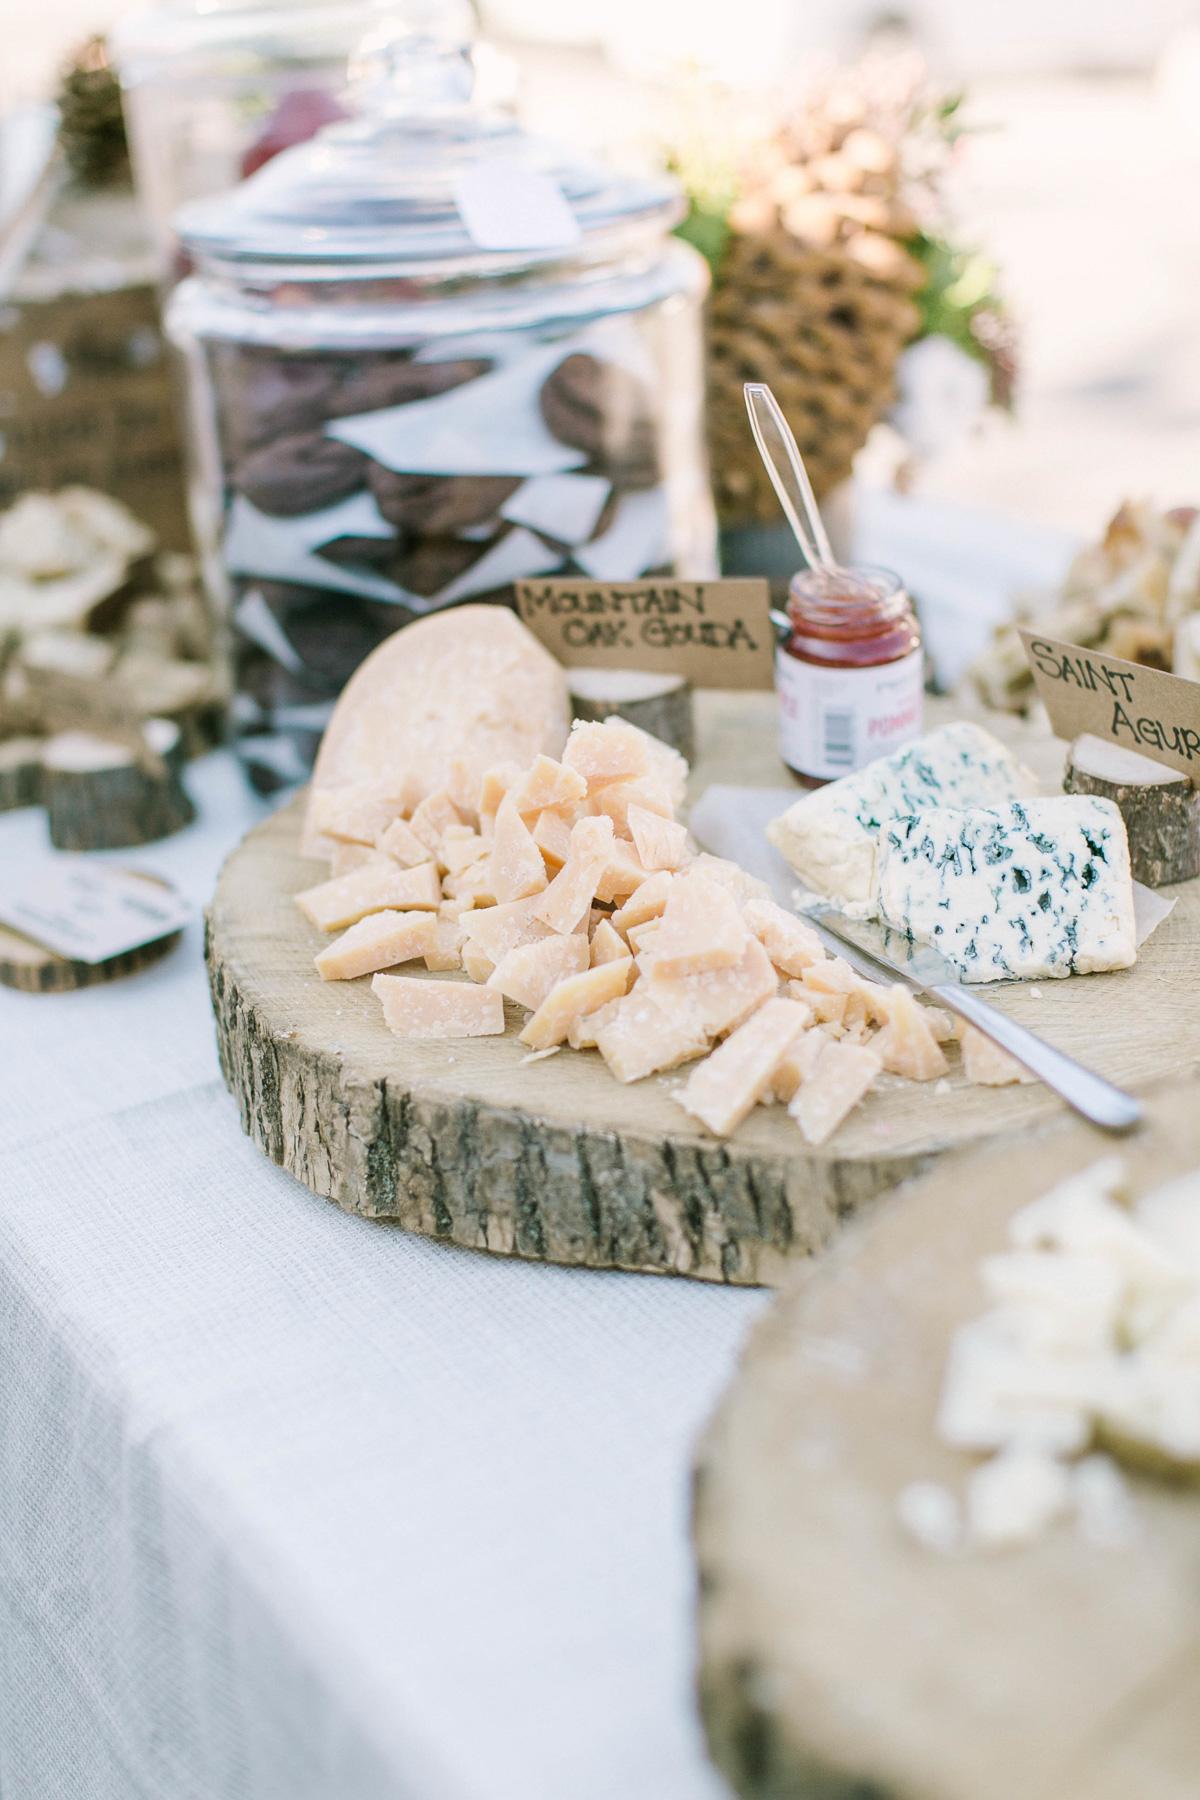 the-first-look-vineyard-bride-swish-list-kurtz-orchards-market-niagara-on-the-lake-wedding-show-36.jpg